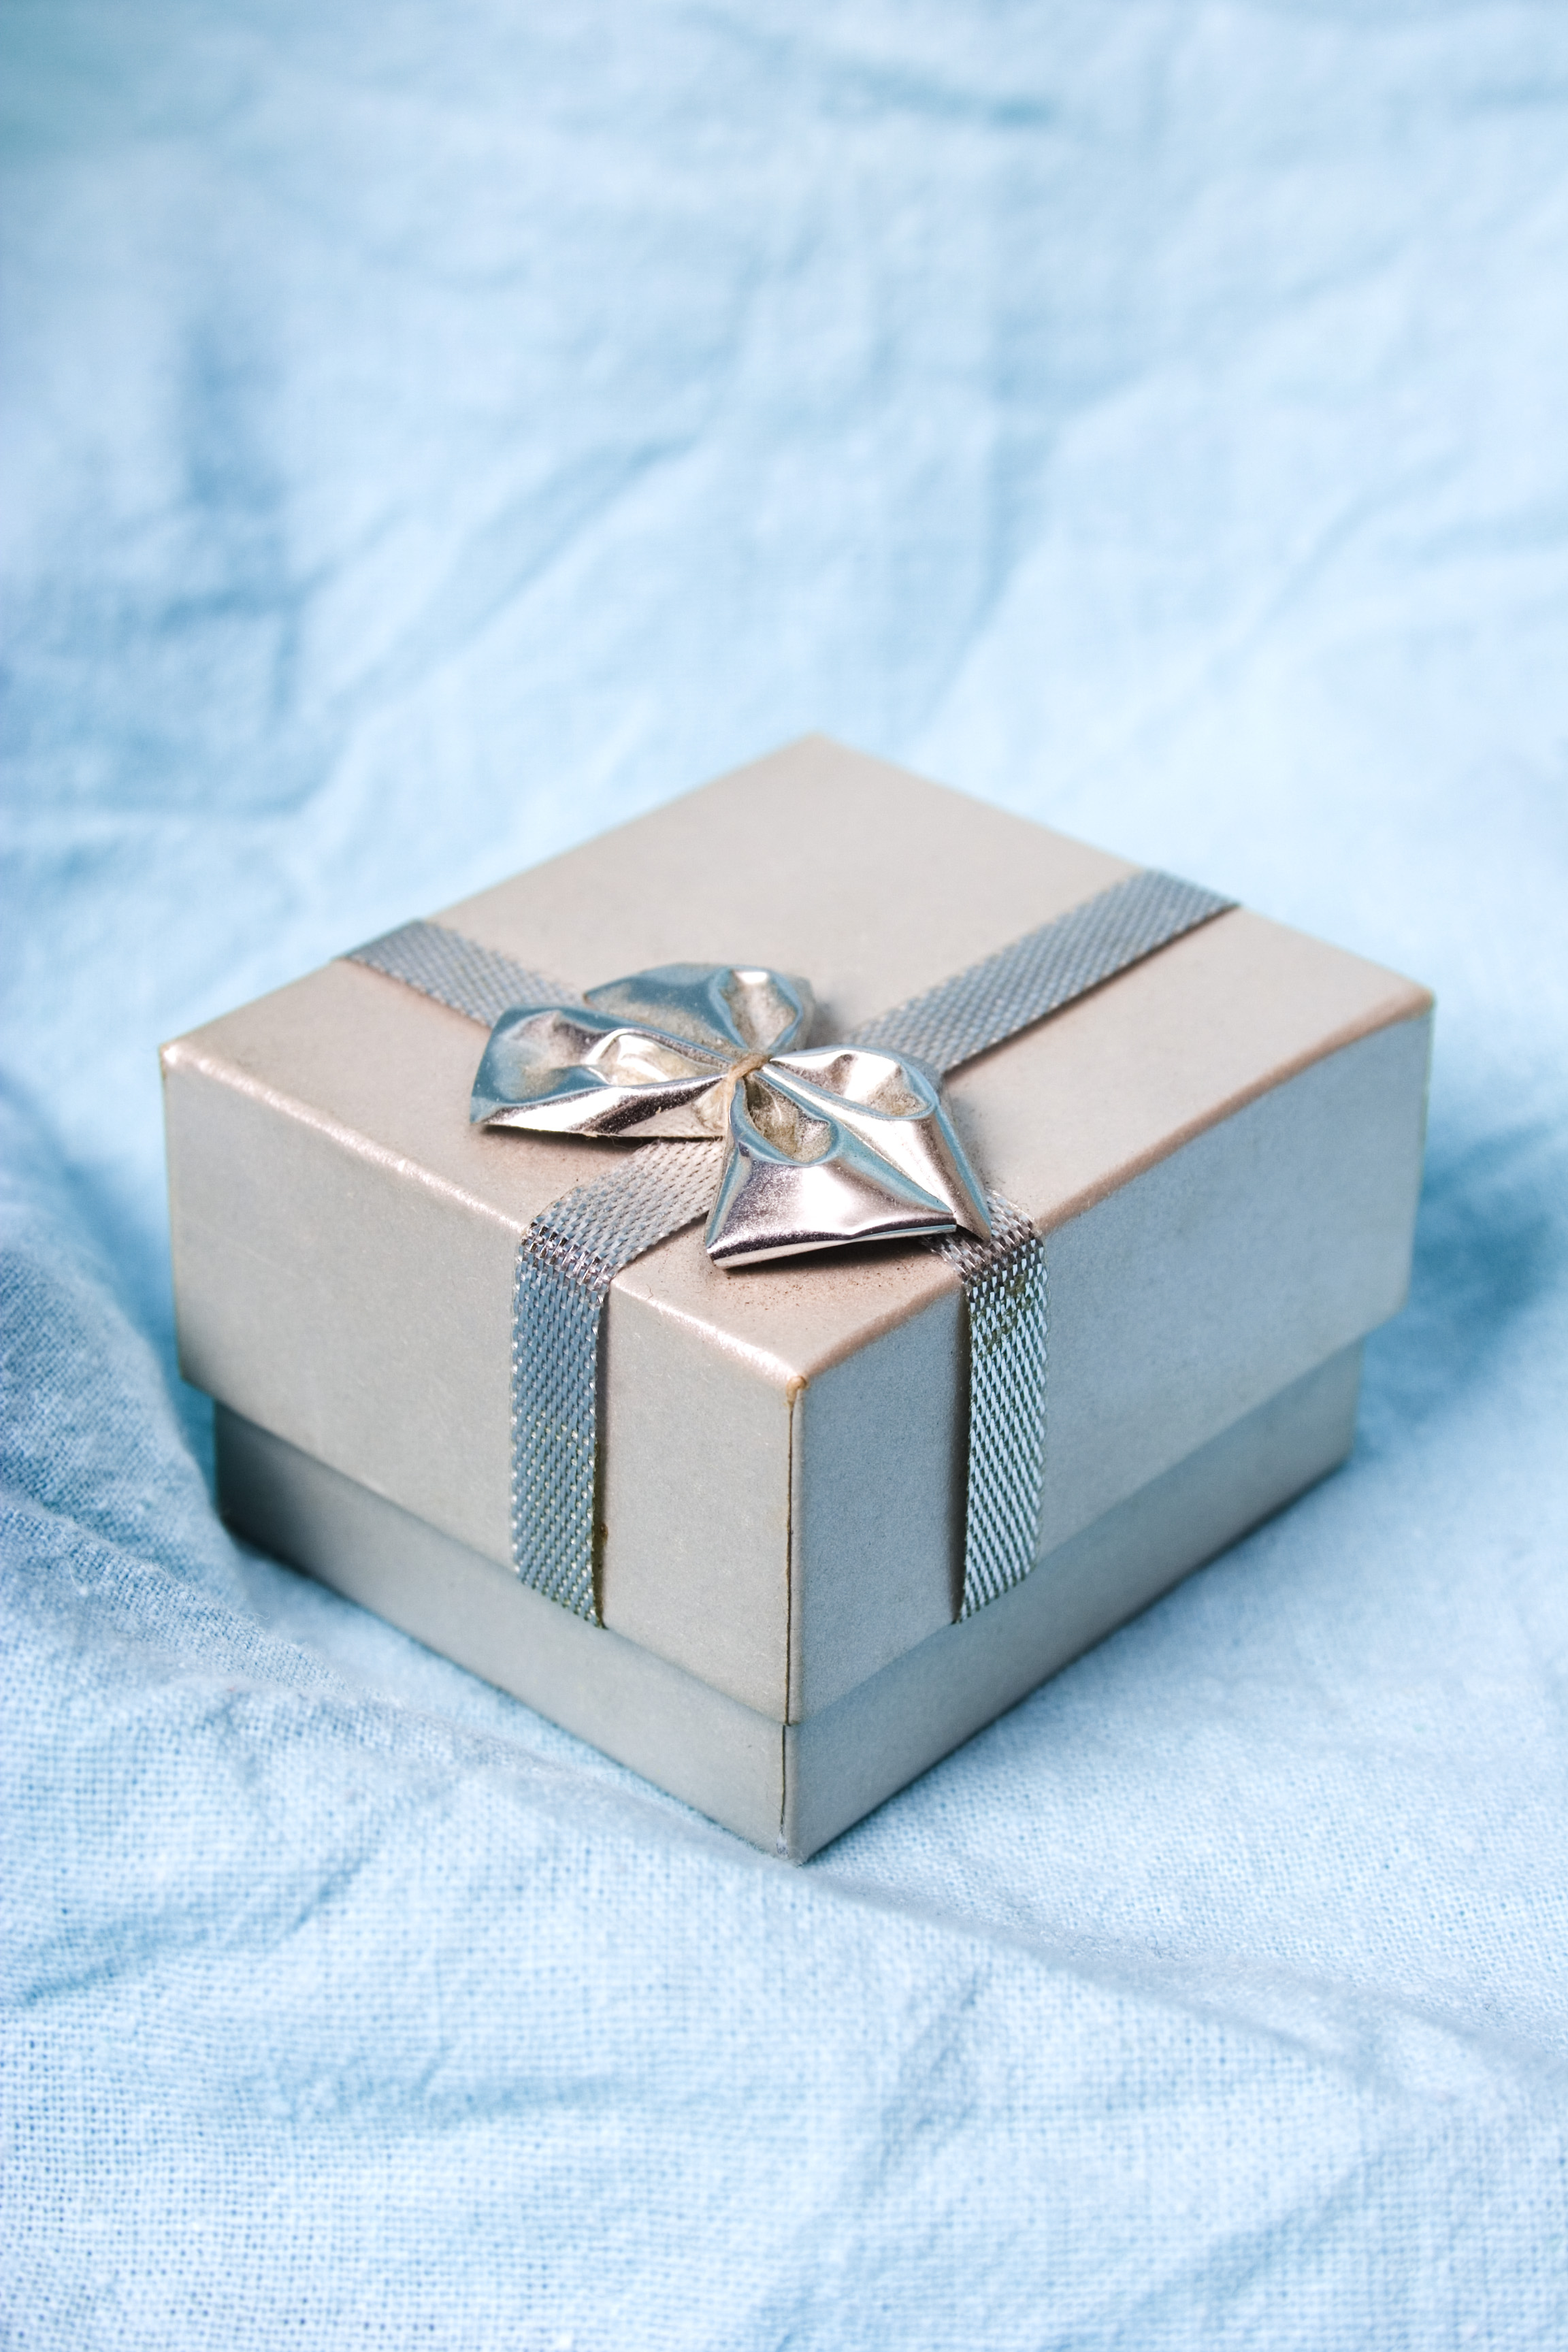 Ideal gift godmother pooch for a baptism